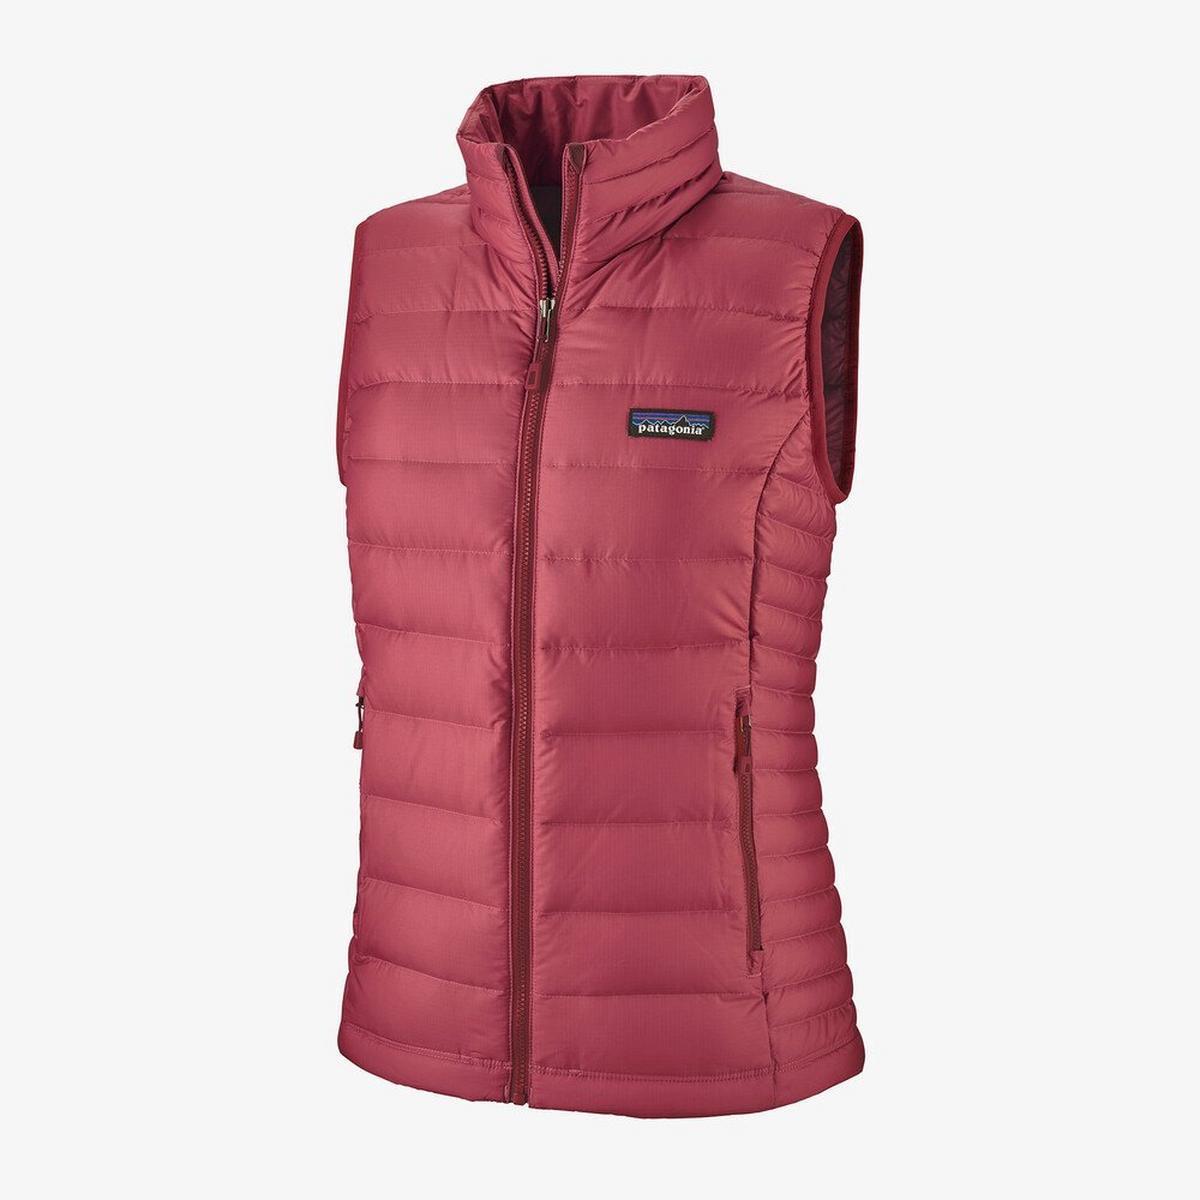 Patagonia Women's Patagonia Down Sweater Vest - Red